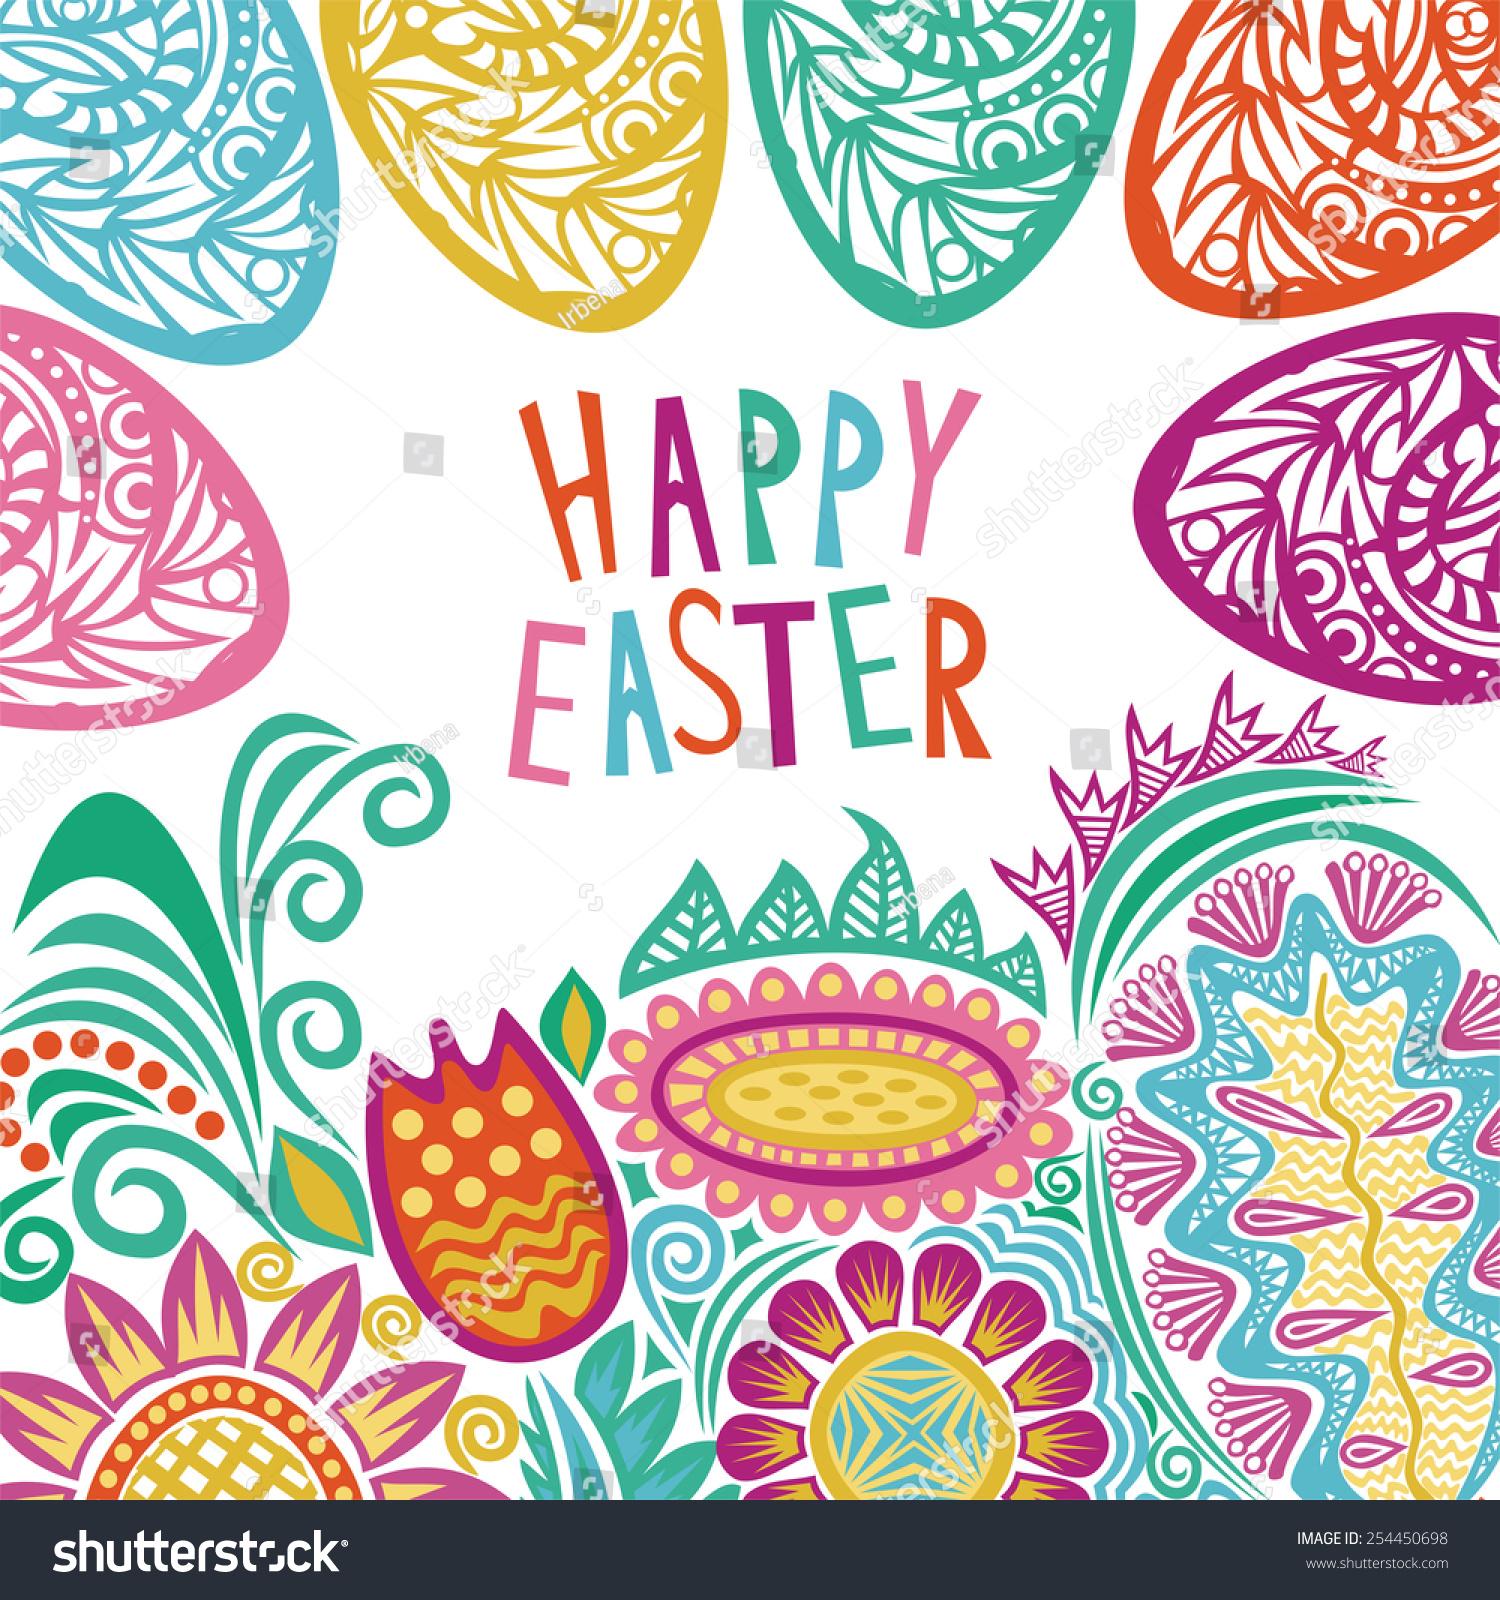 Happy Easter Card Illustration Stock Illustration ...